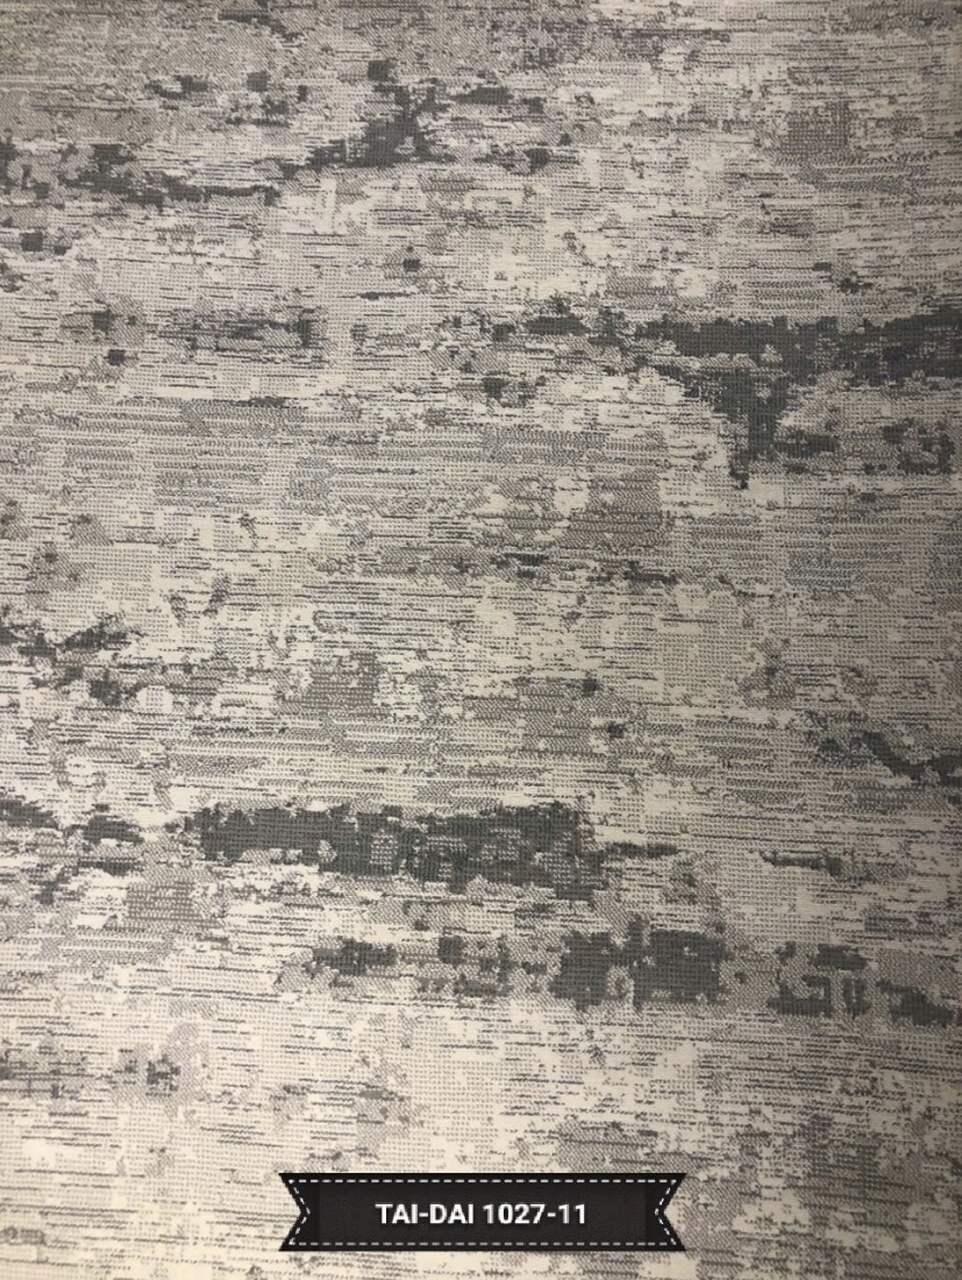 Tapete Tai Dai ref. 1027-11 - 200 x 250 cm